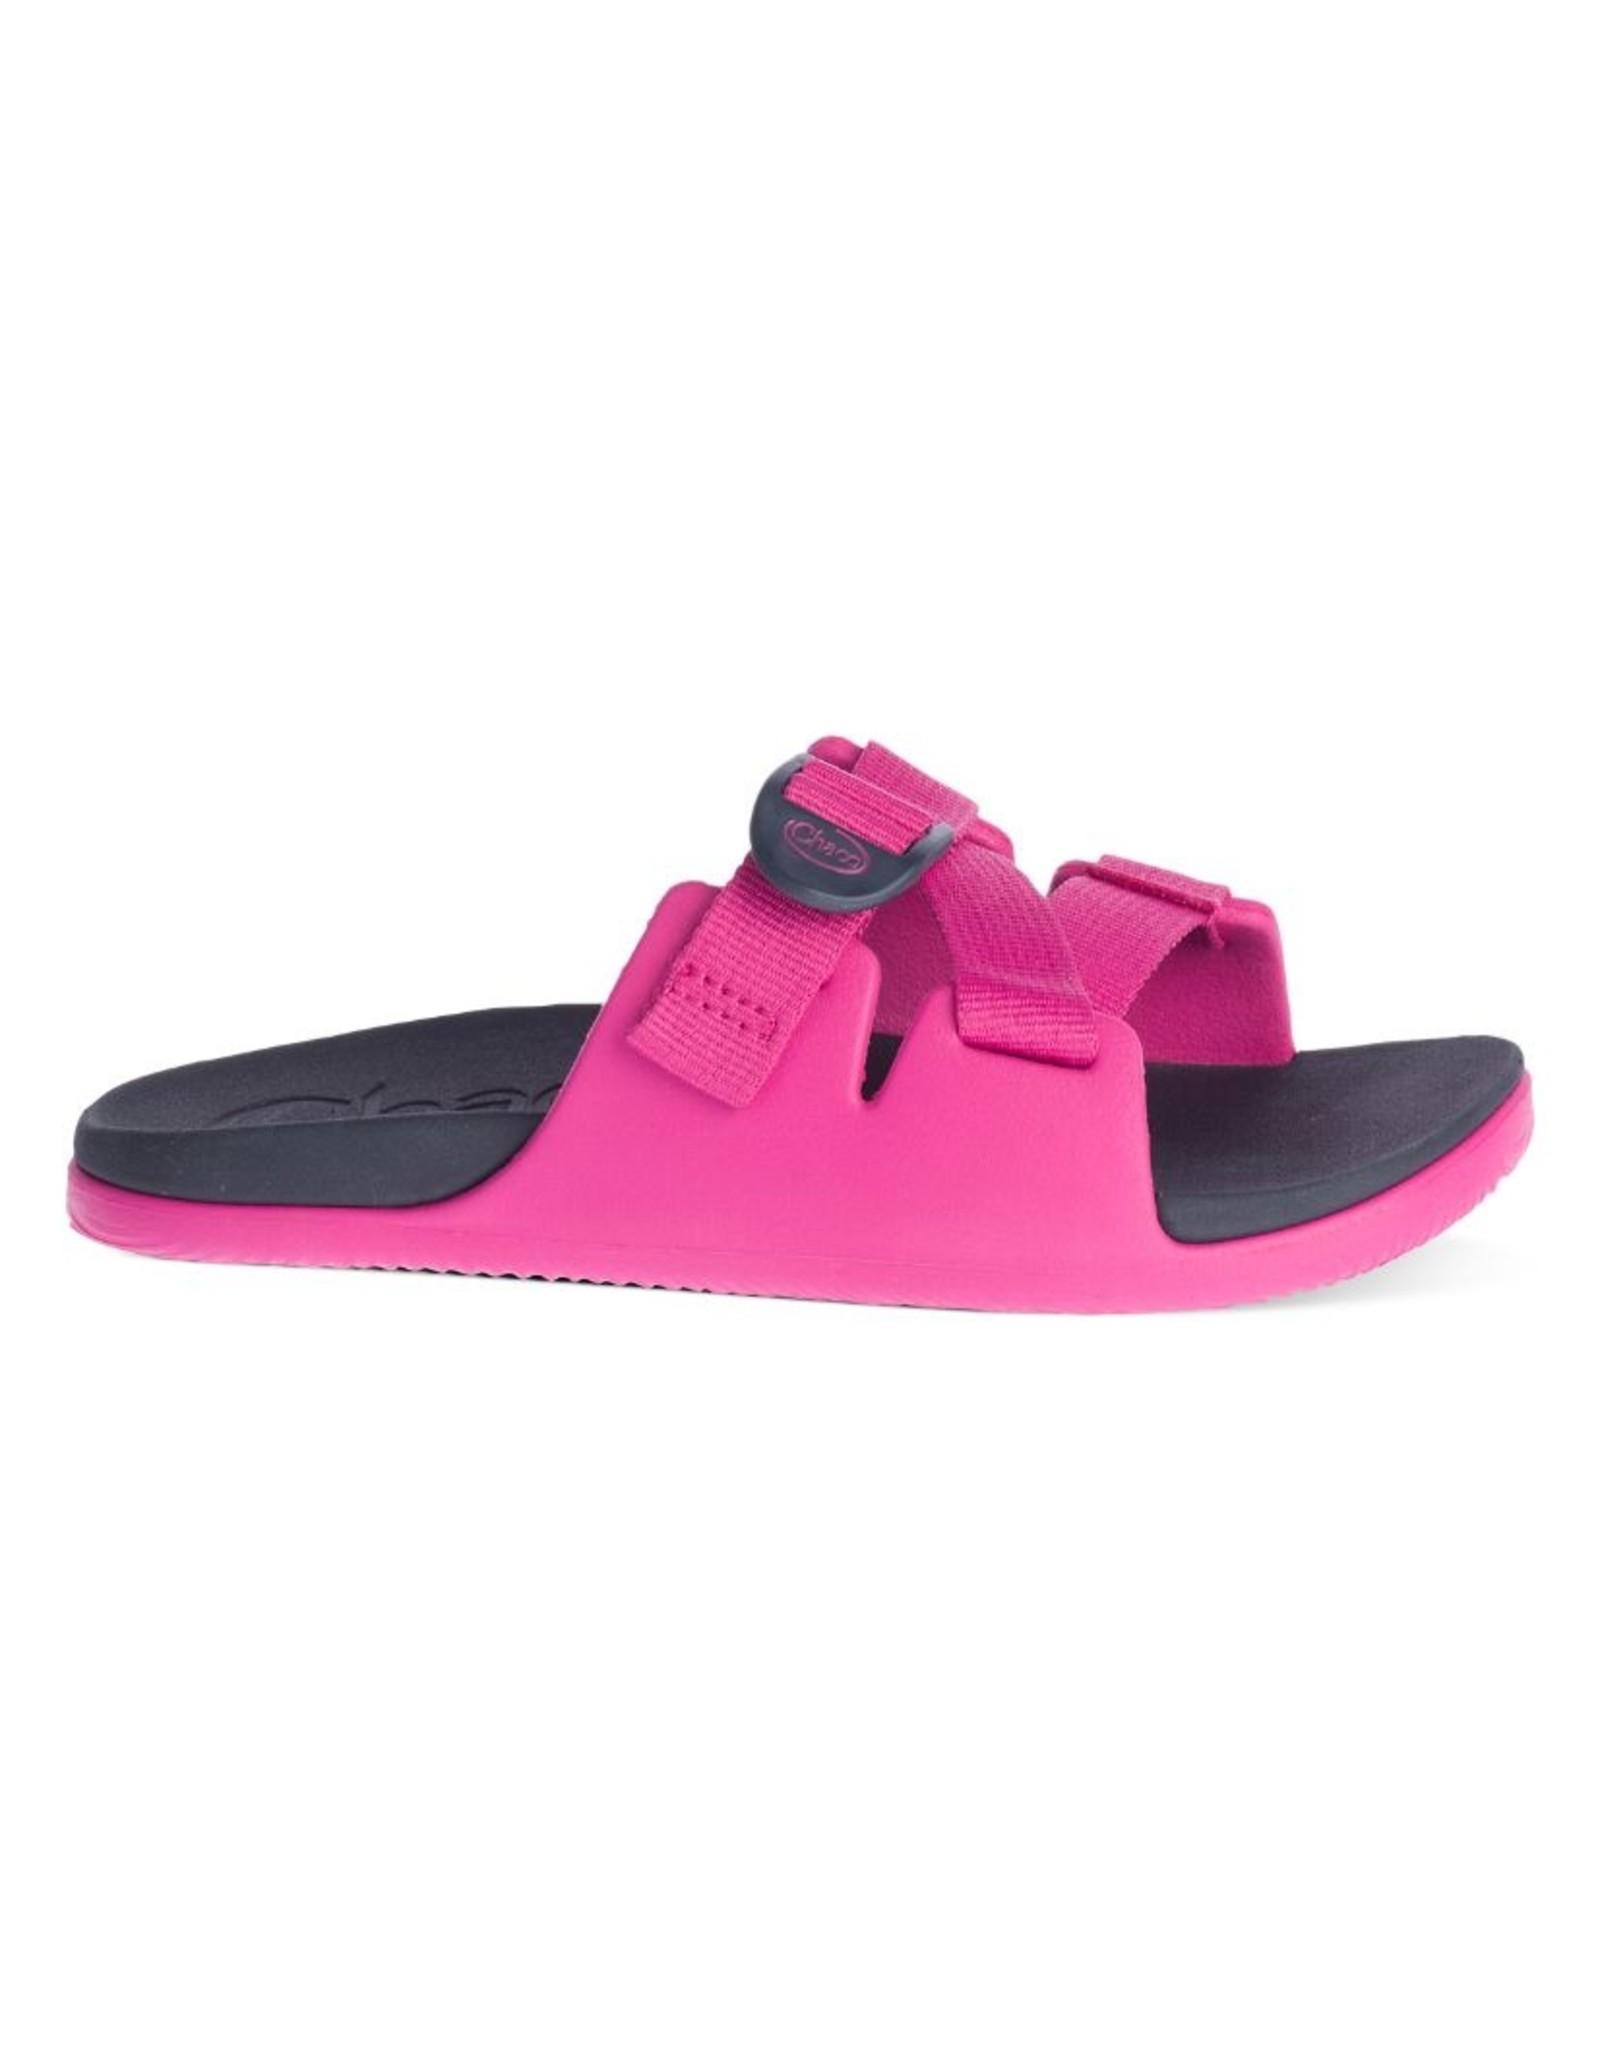 Chaco Chaco Big Kid's Chillos Slide Sandals